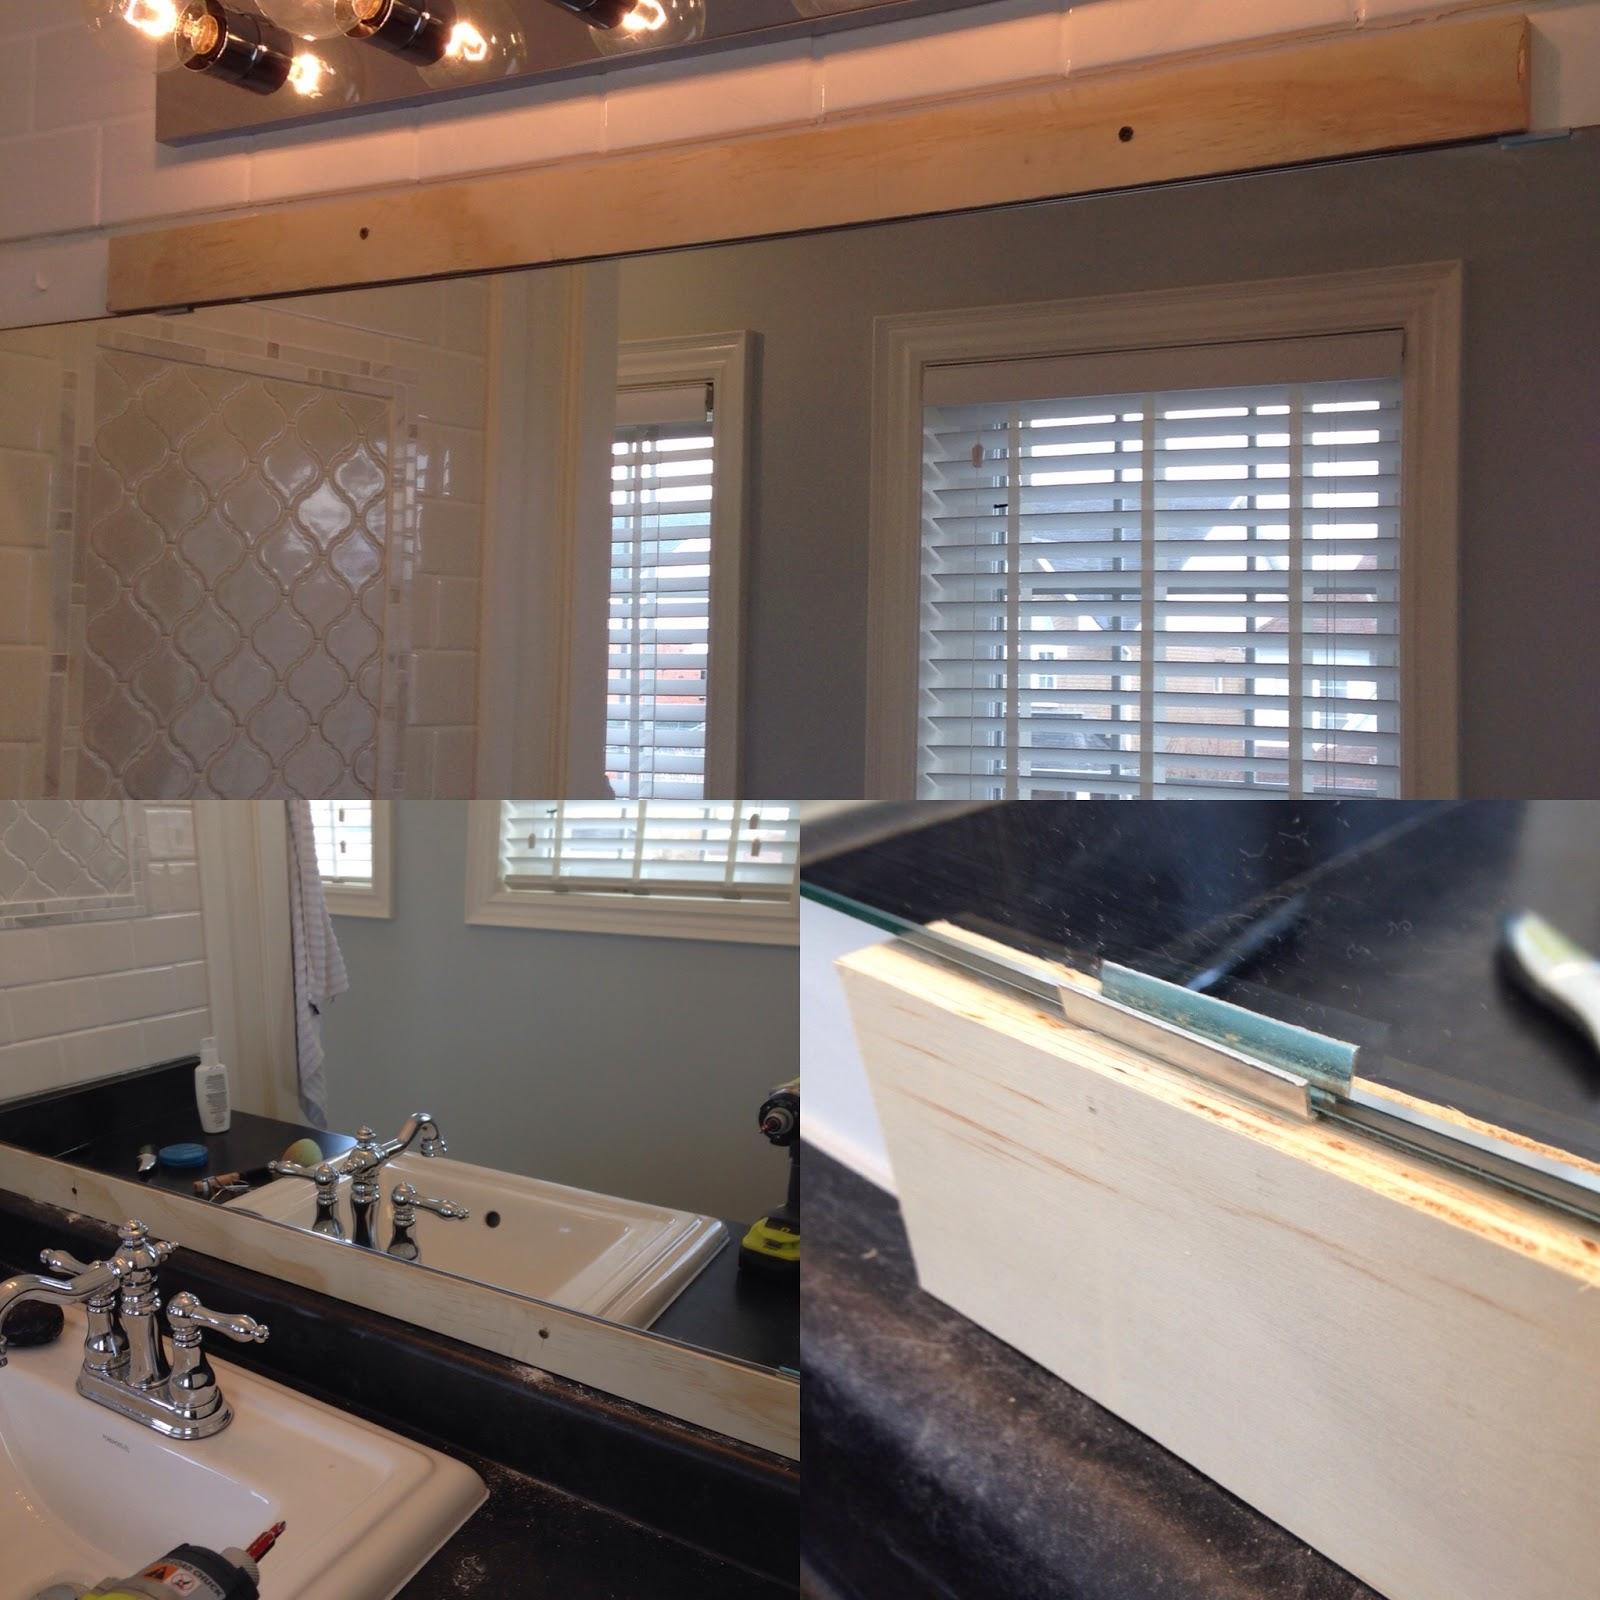 White Wood Weekend bathroom update to frame a bathroom mirror